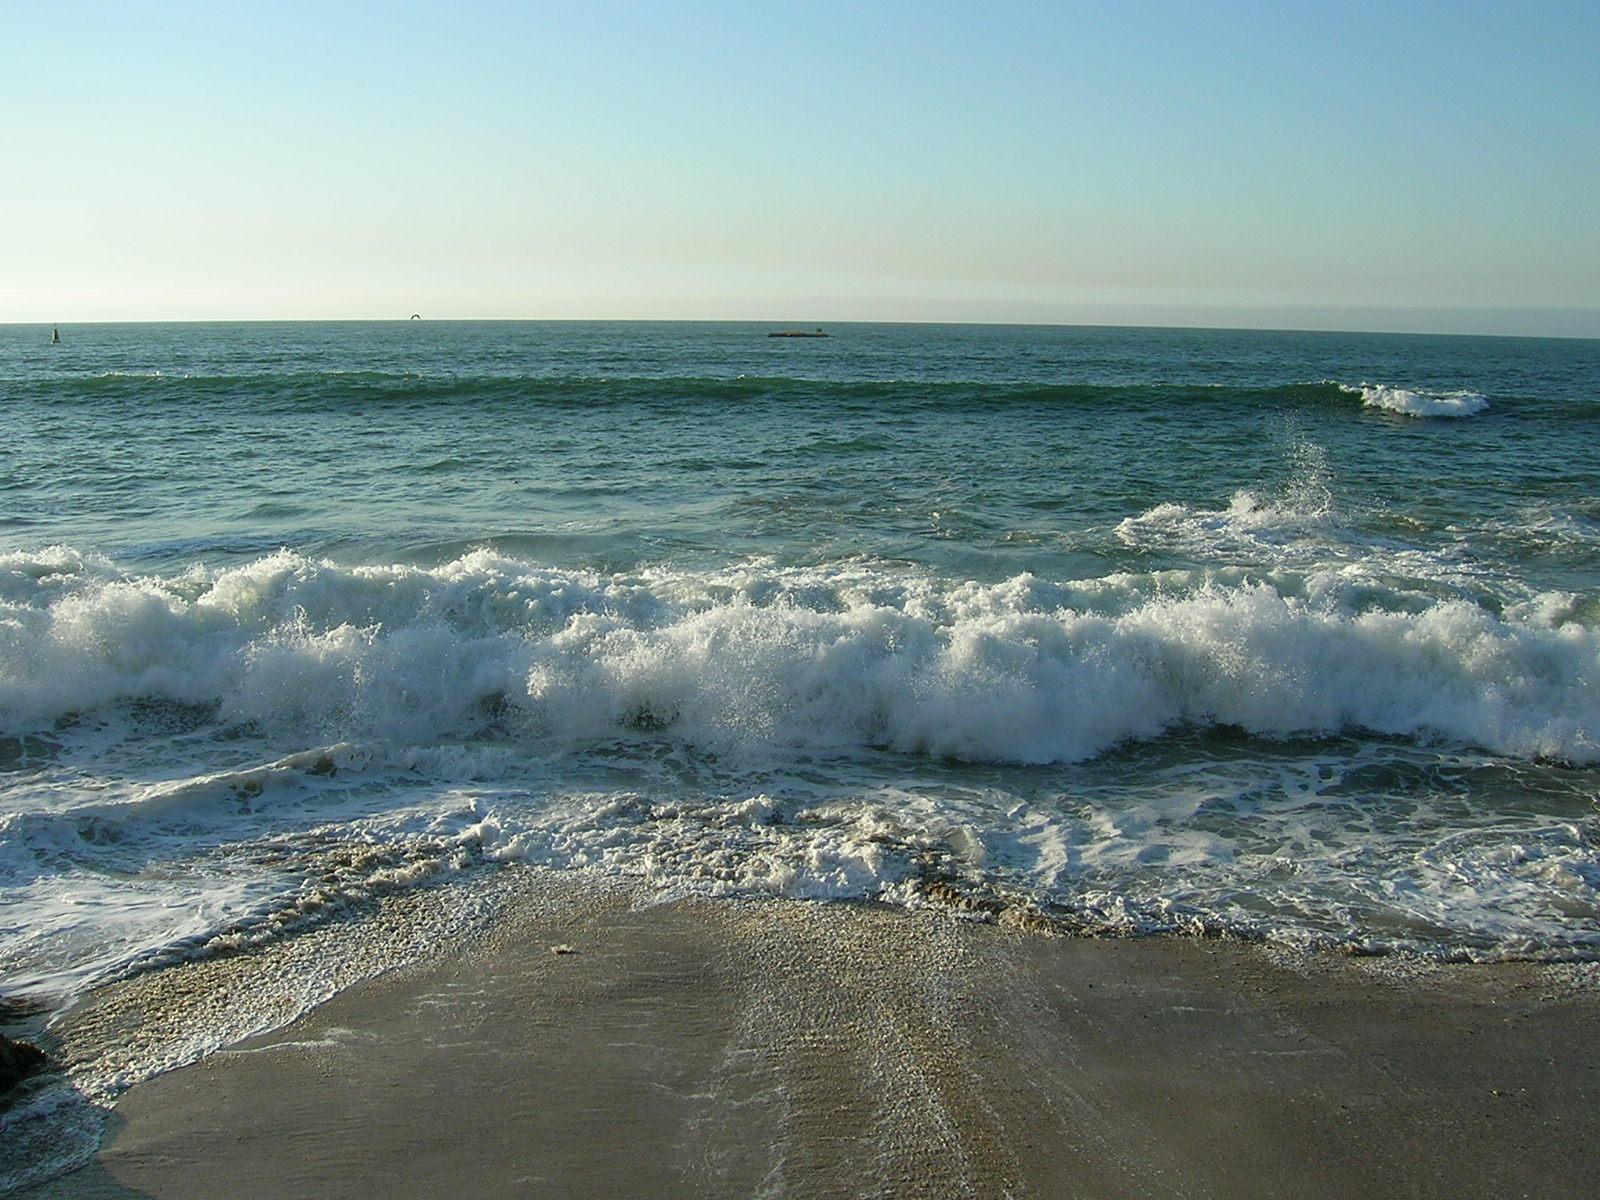 Sea by ephedrina-stock